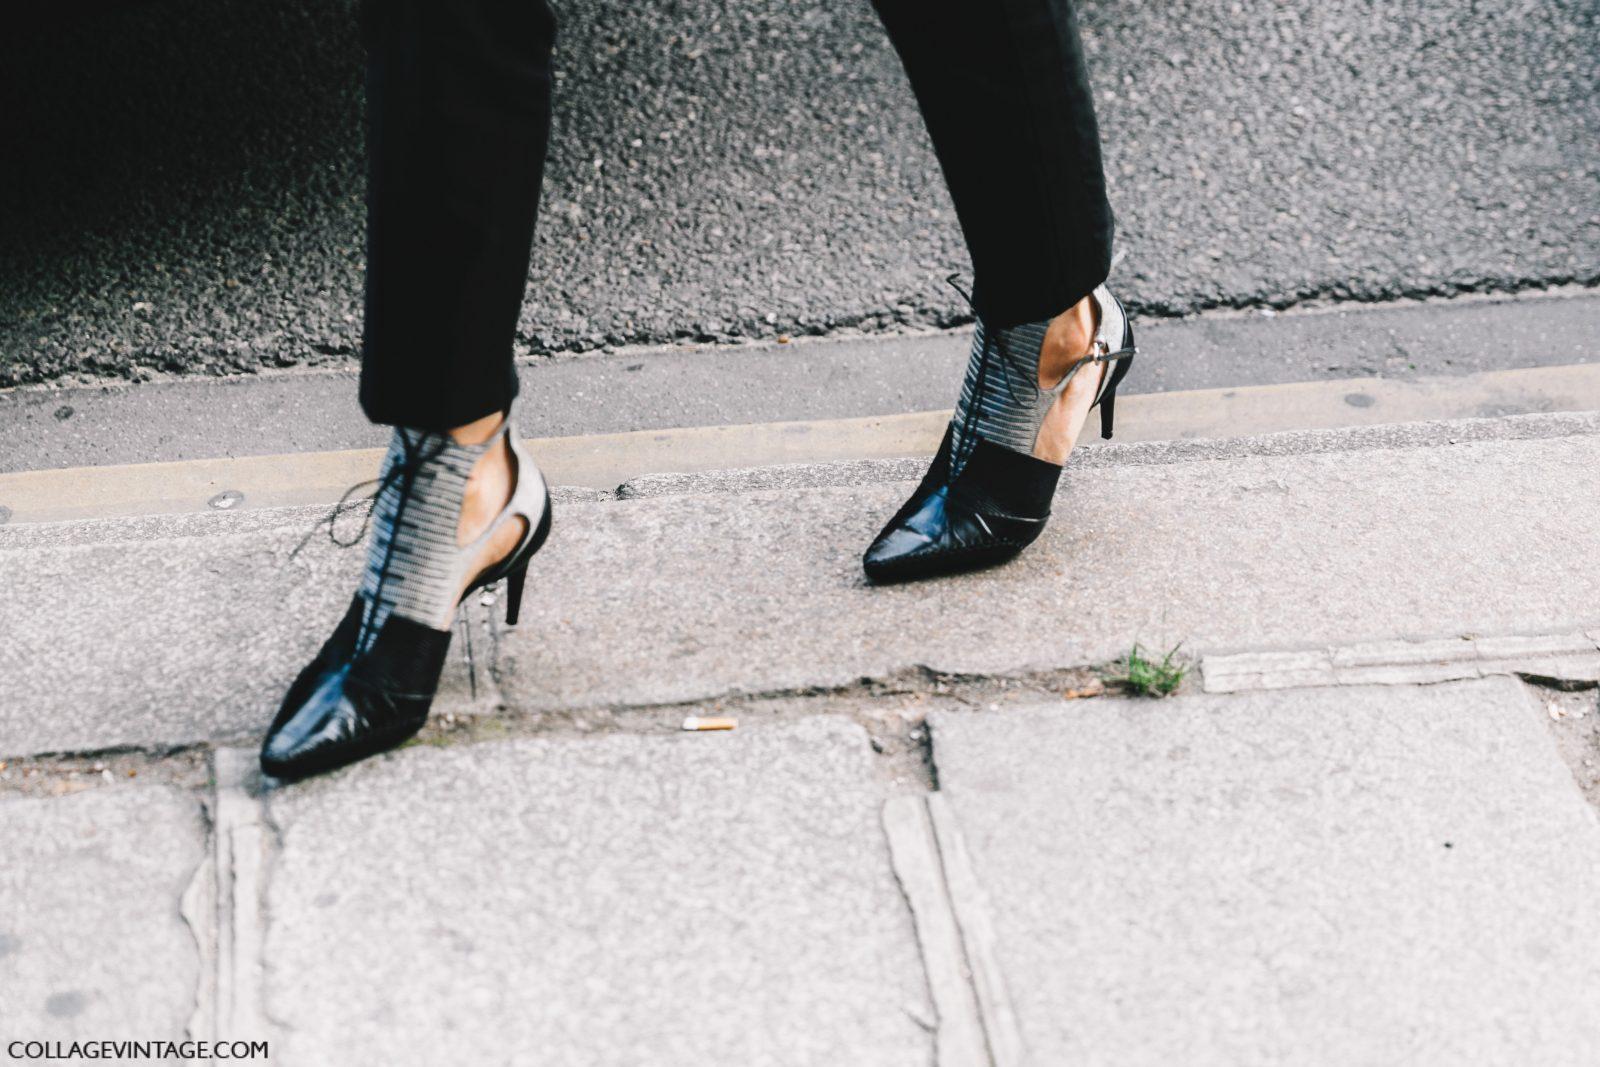 pfw-paris_fashion_week_ss17-street_style-outfits-collage_vintage-rochas-courreges-dries_van_noten-lanvin-guy_laroche